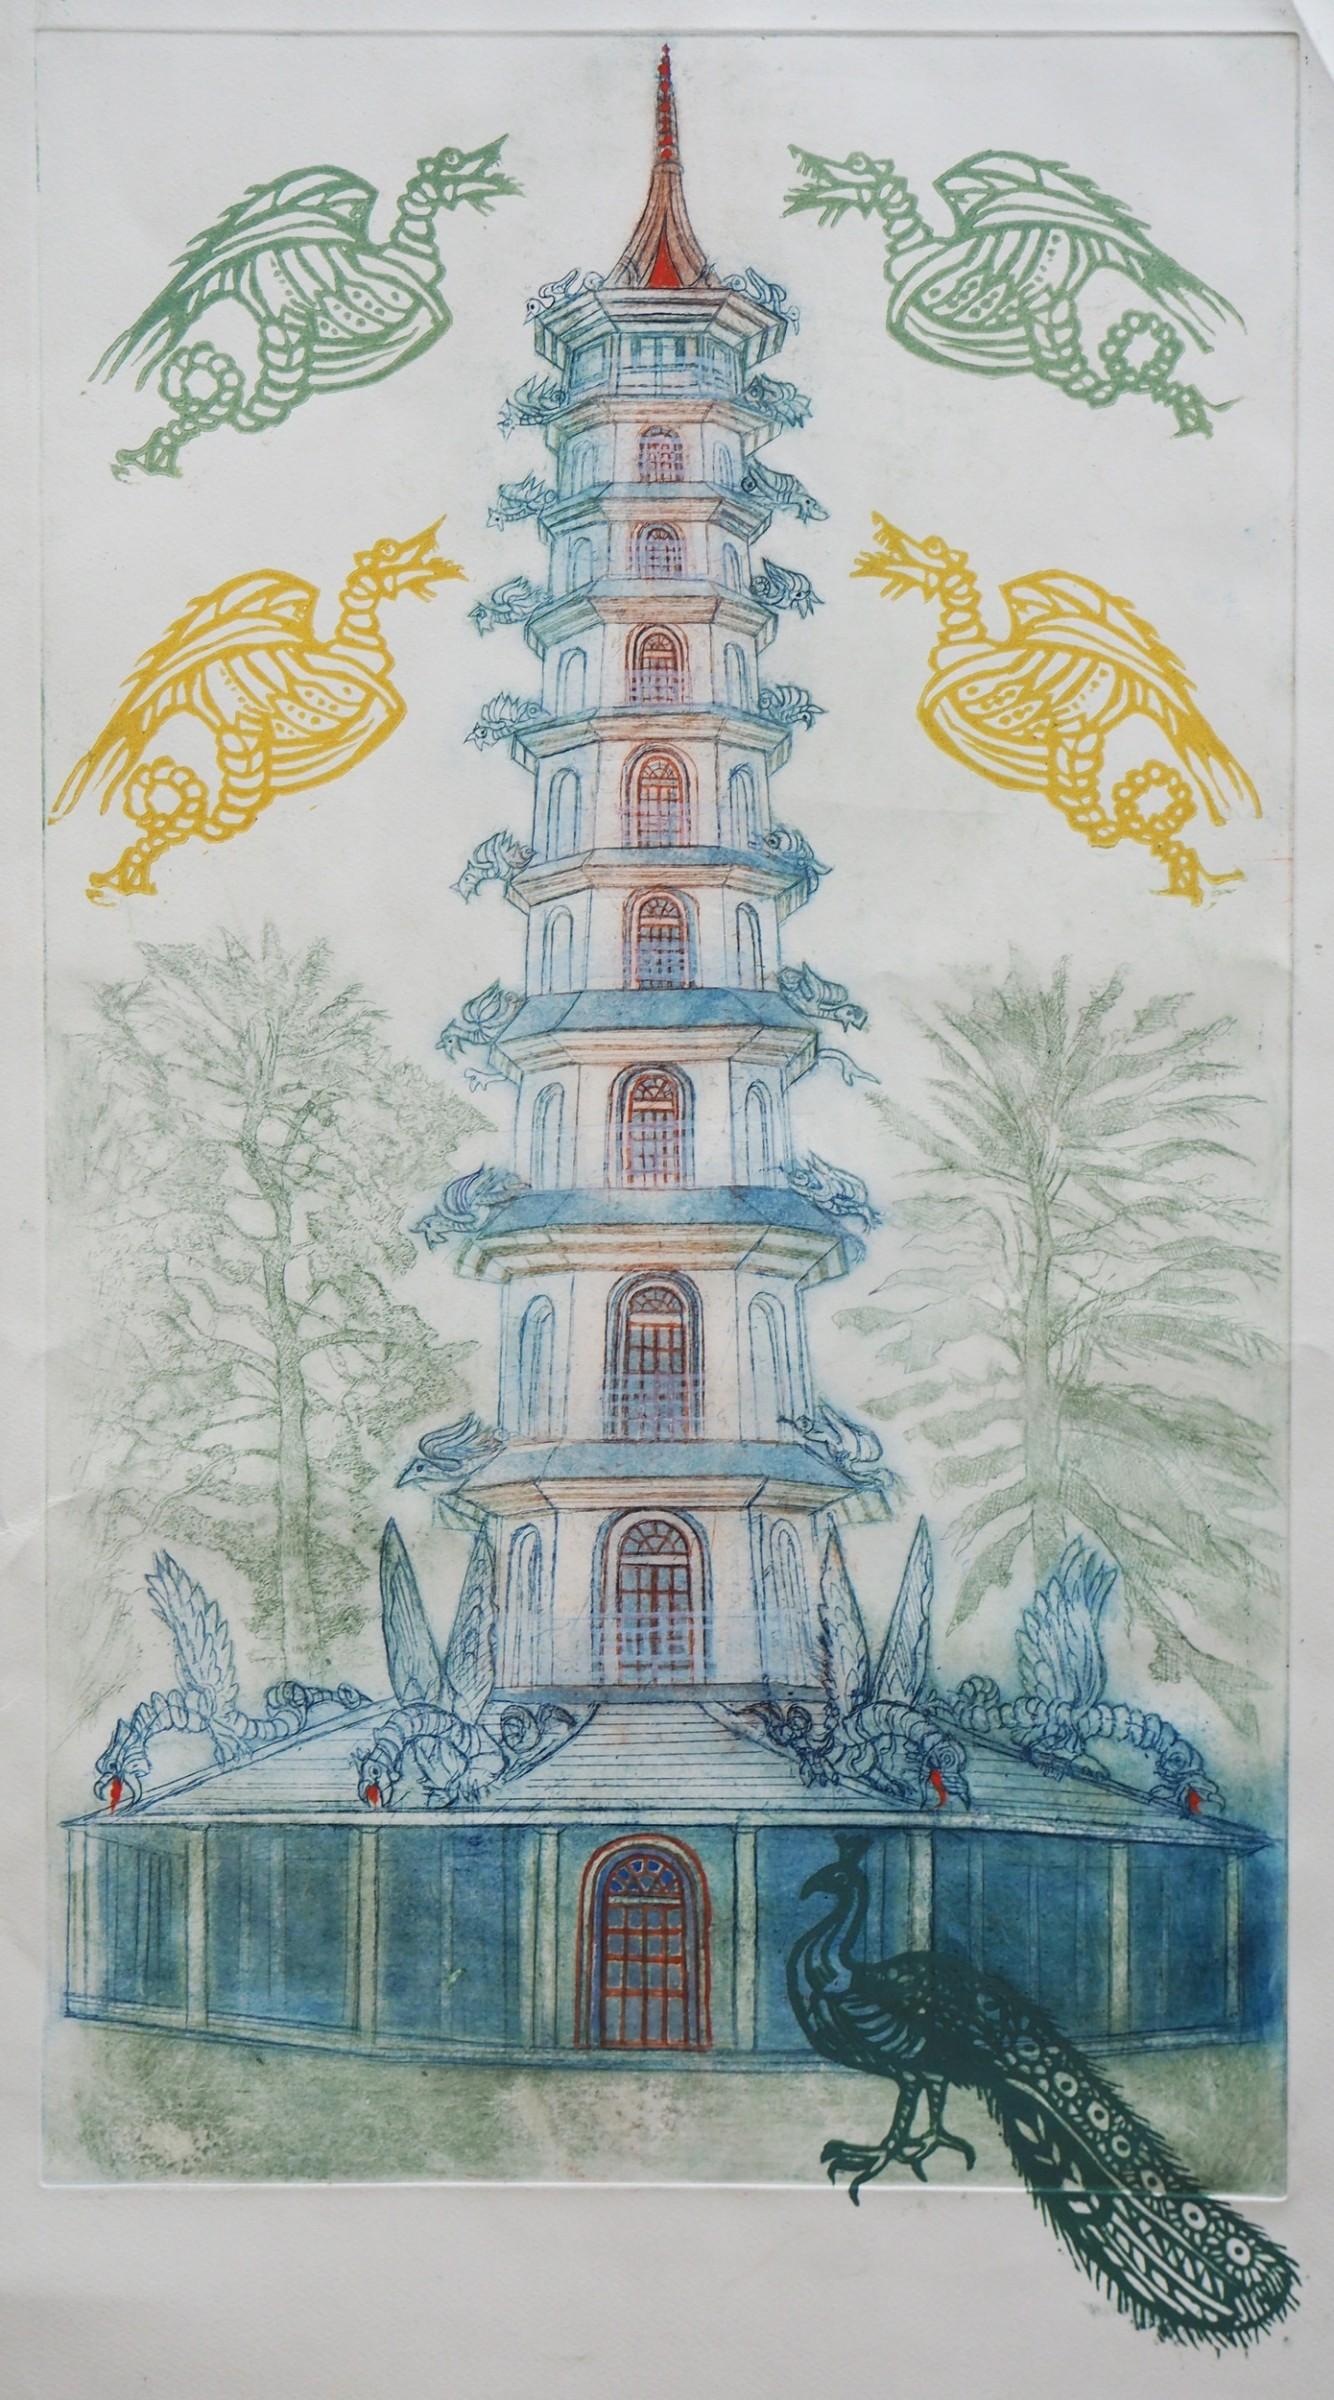 "<span class=""link fancybox-details-link""><a href=""/artists/36-richard-bawden-rws-re/works/10675/"">View Detail Page</a></span><div class=""artist""><span class=""artist""><strong>Richard Bawden RWS RE</strong></span></div><div class=""title""><em>The Great Pagoda, Kew Gardens</em></div><div class=""medium"">etching, linocut and hand colouring<br /> </div><div class=""dimensions"">76 x 42 cm image size<br /> </div><div class=""edition_details"">edition of 50<br /> </div><div class=""price"">£520.00 unframed</div>"